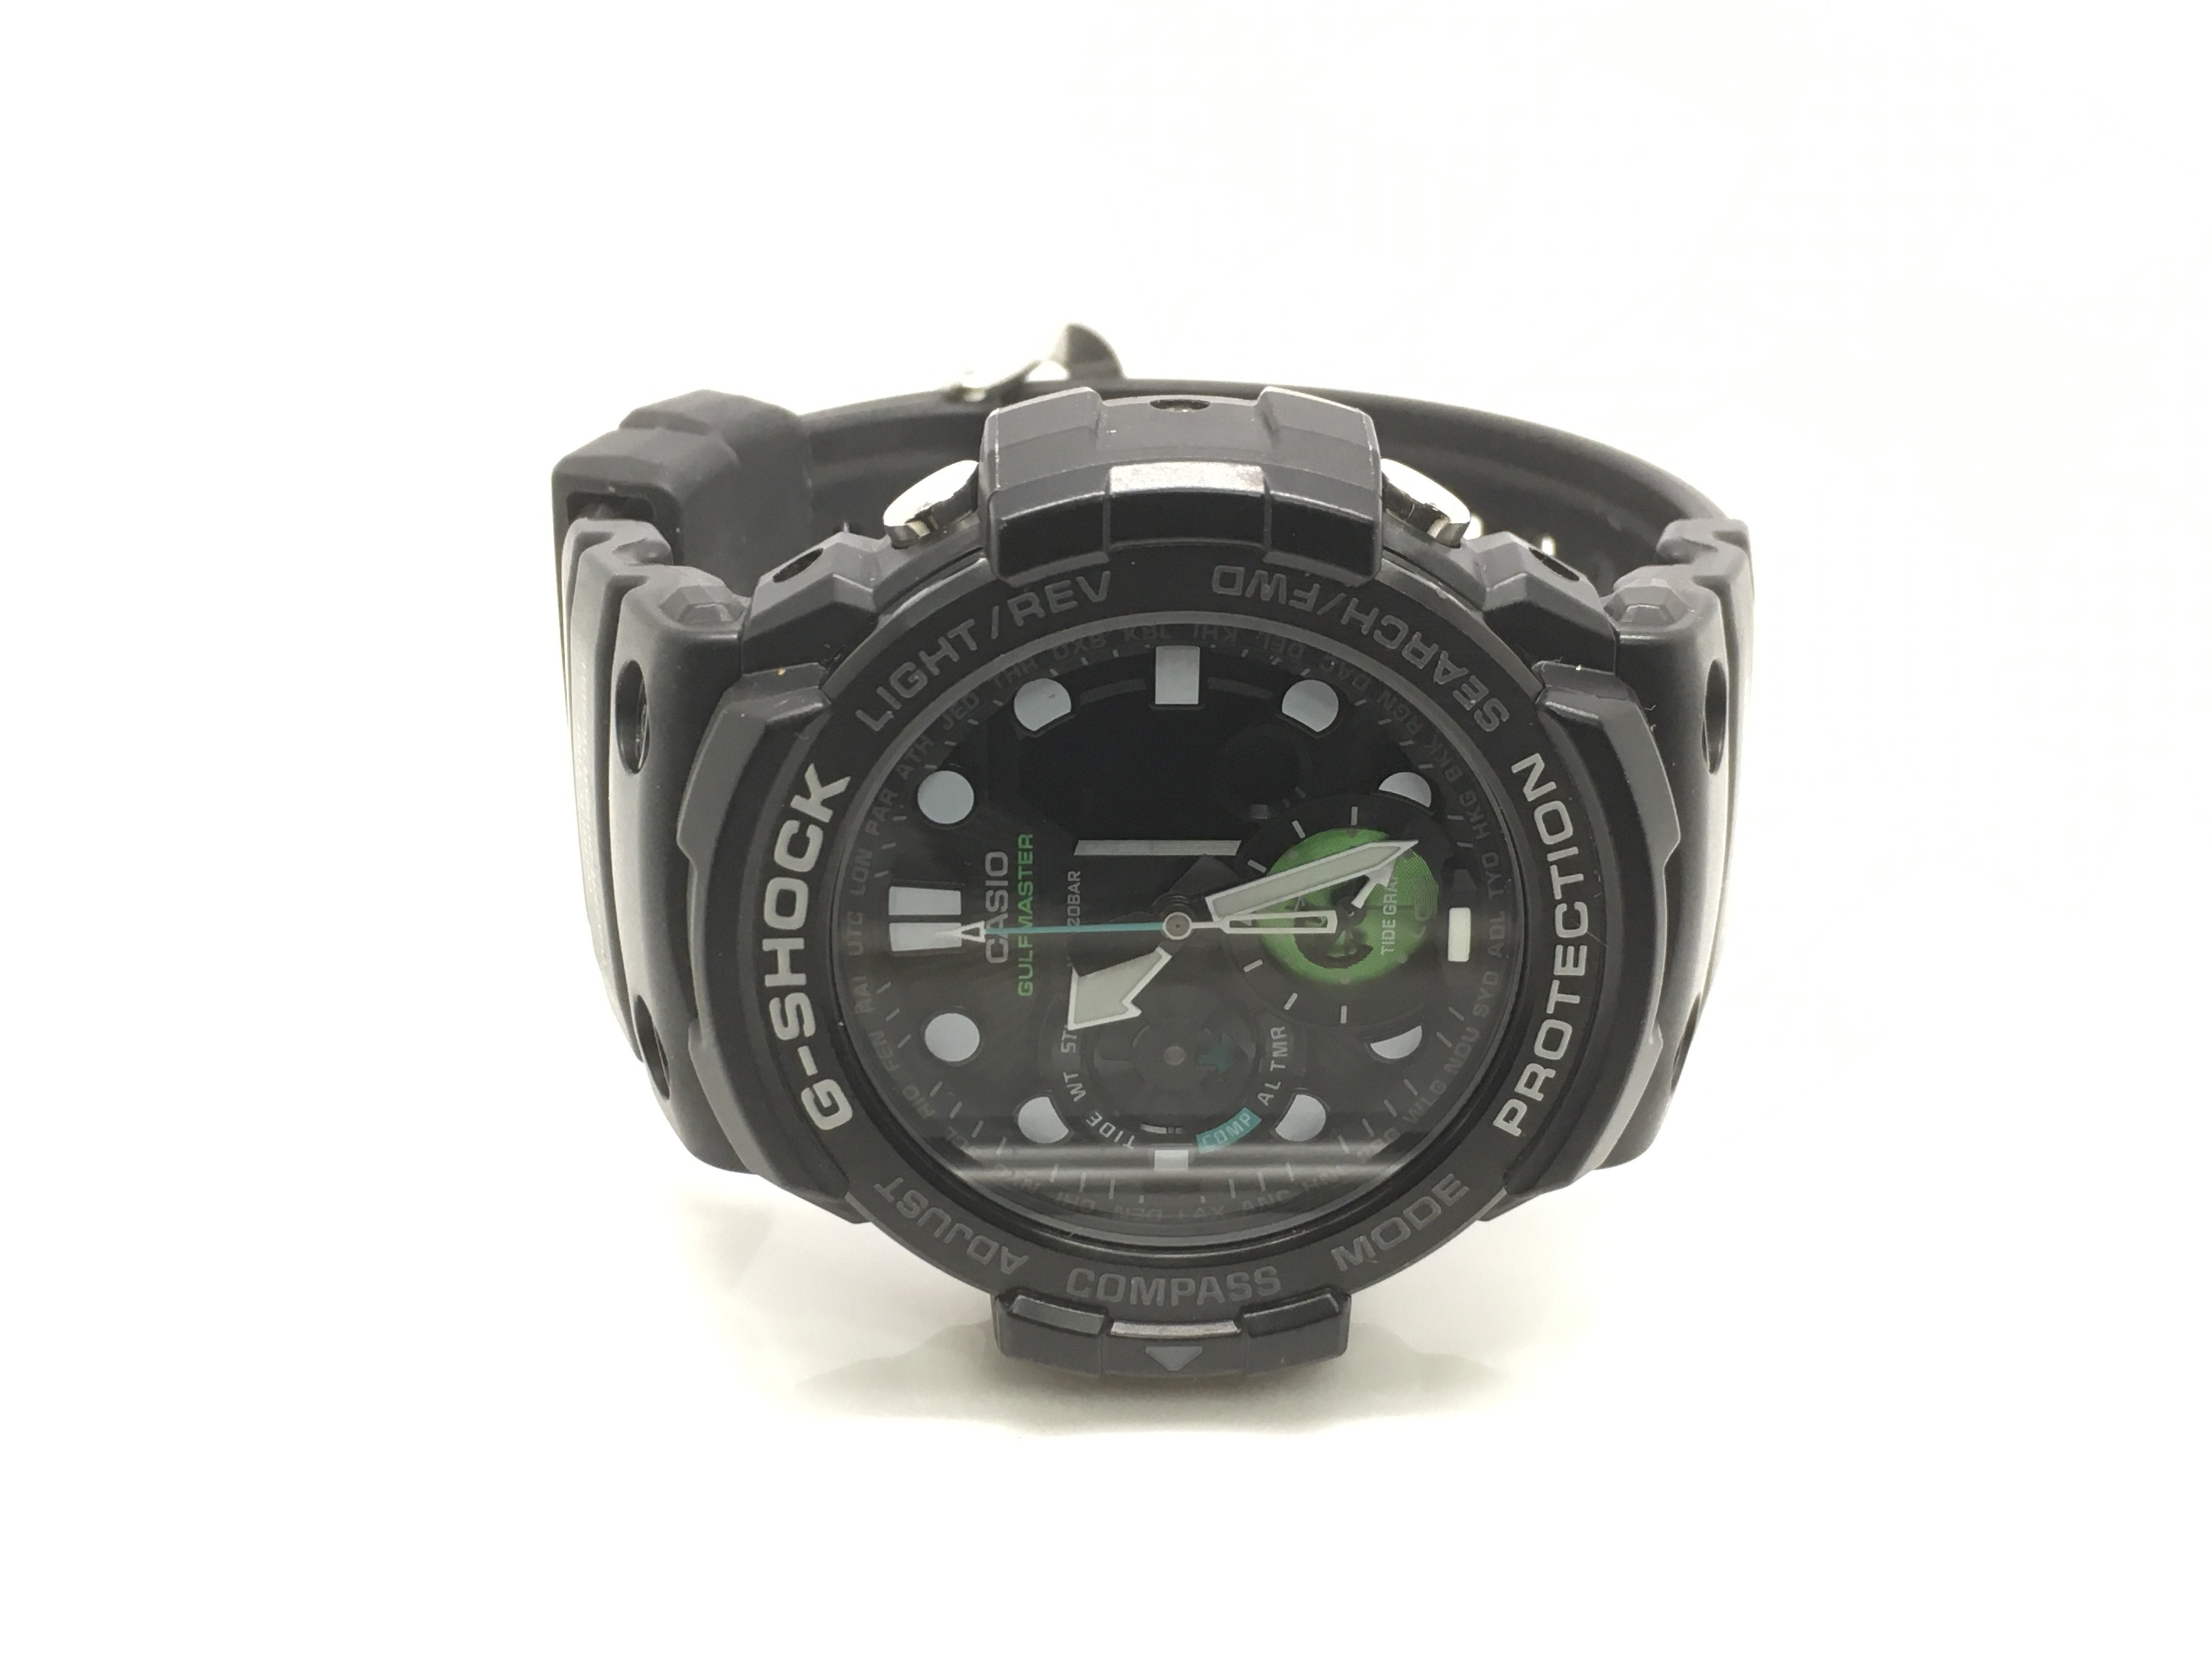 Lot 41 - A Casio G Shock Gulfmaster watch.